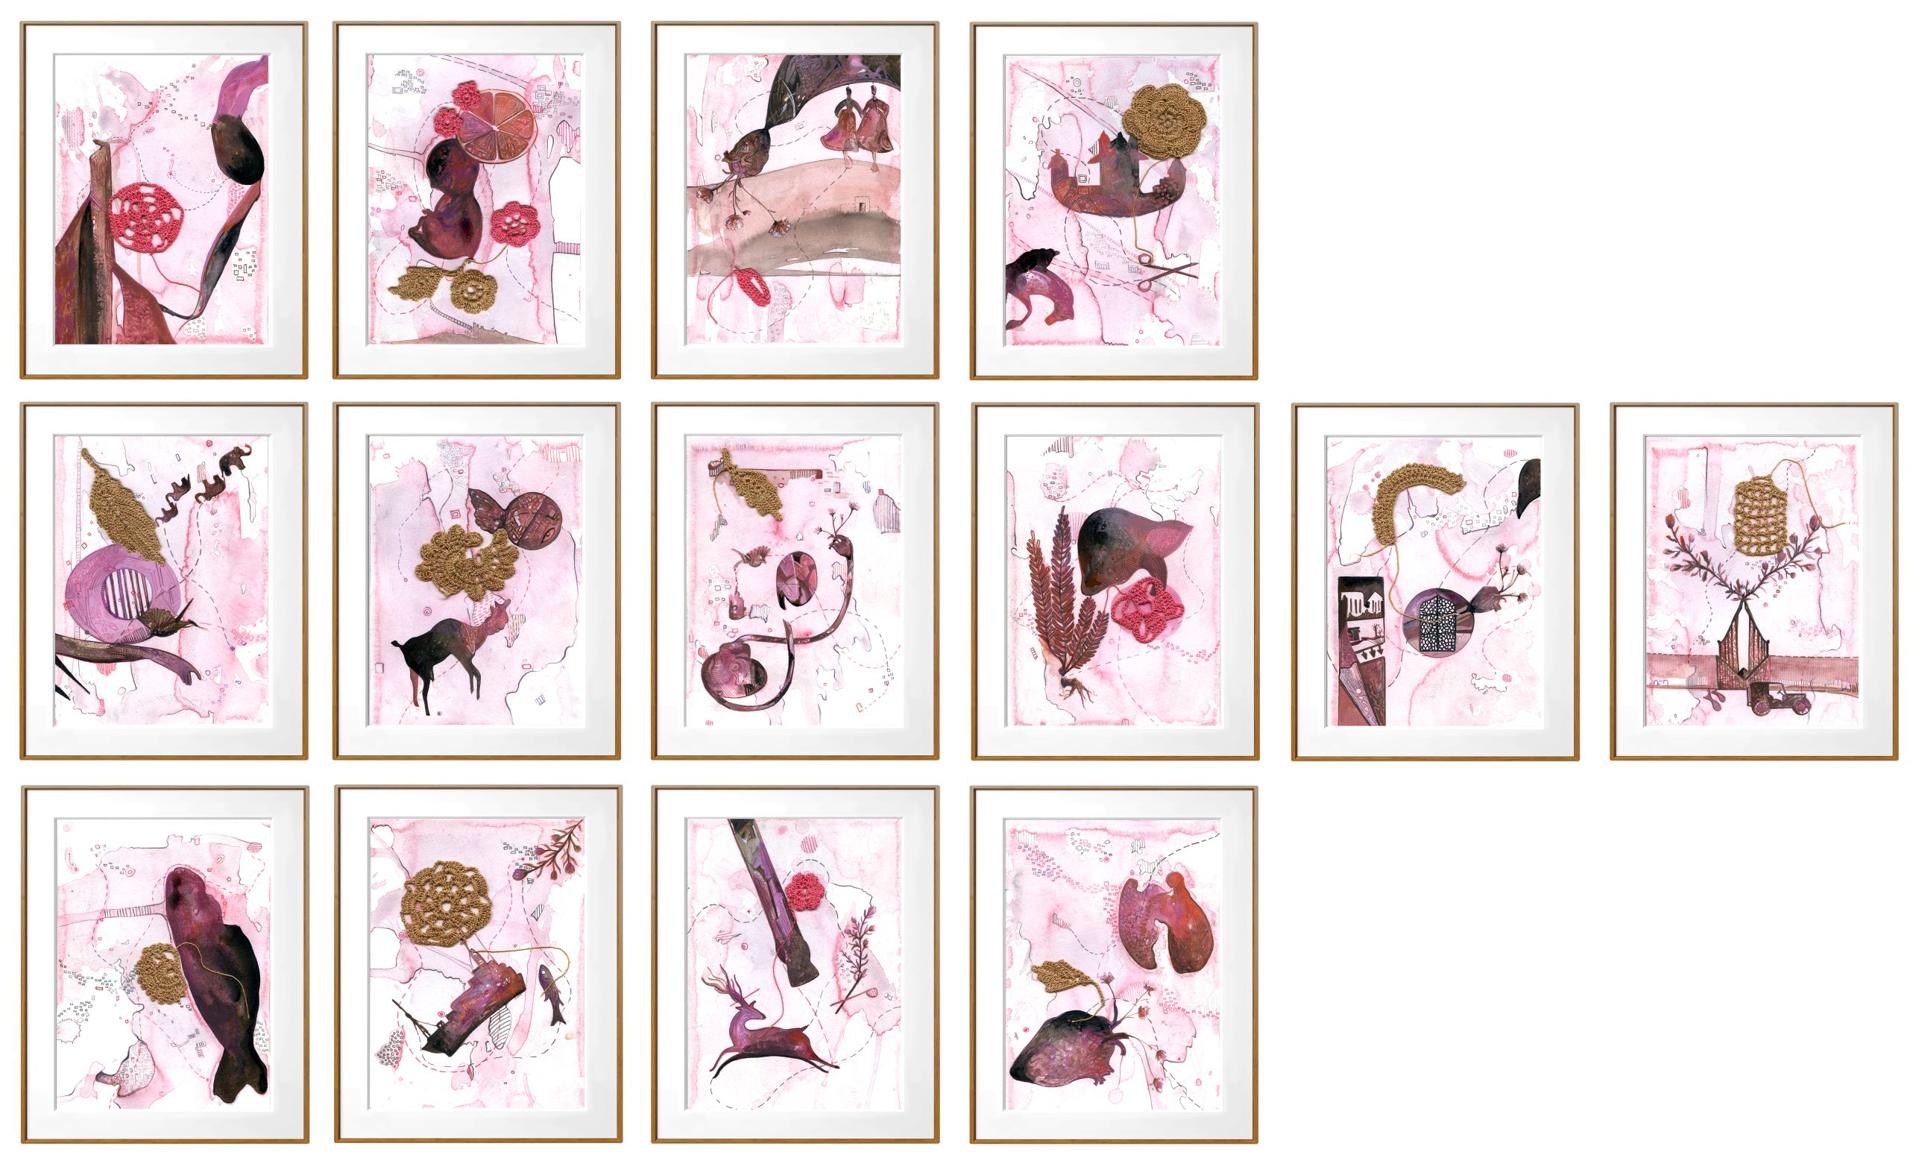 Birth Healing by Ritu Sinha